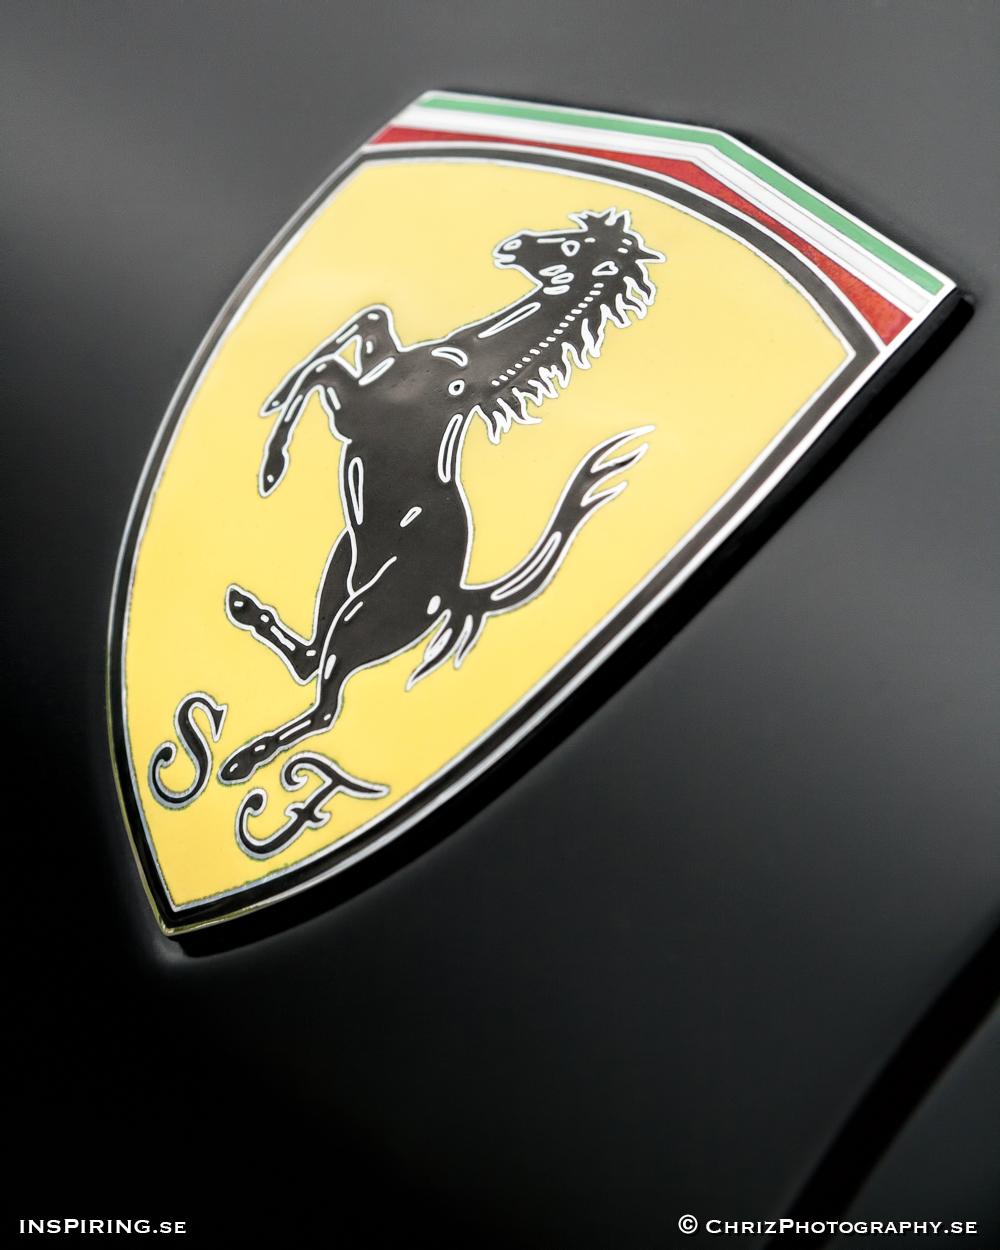 Inspiring.se_OUTTHERE_copyright_ChrizPhotography.se_630_Ferrari_logo.jpg